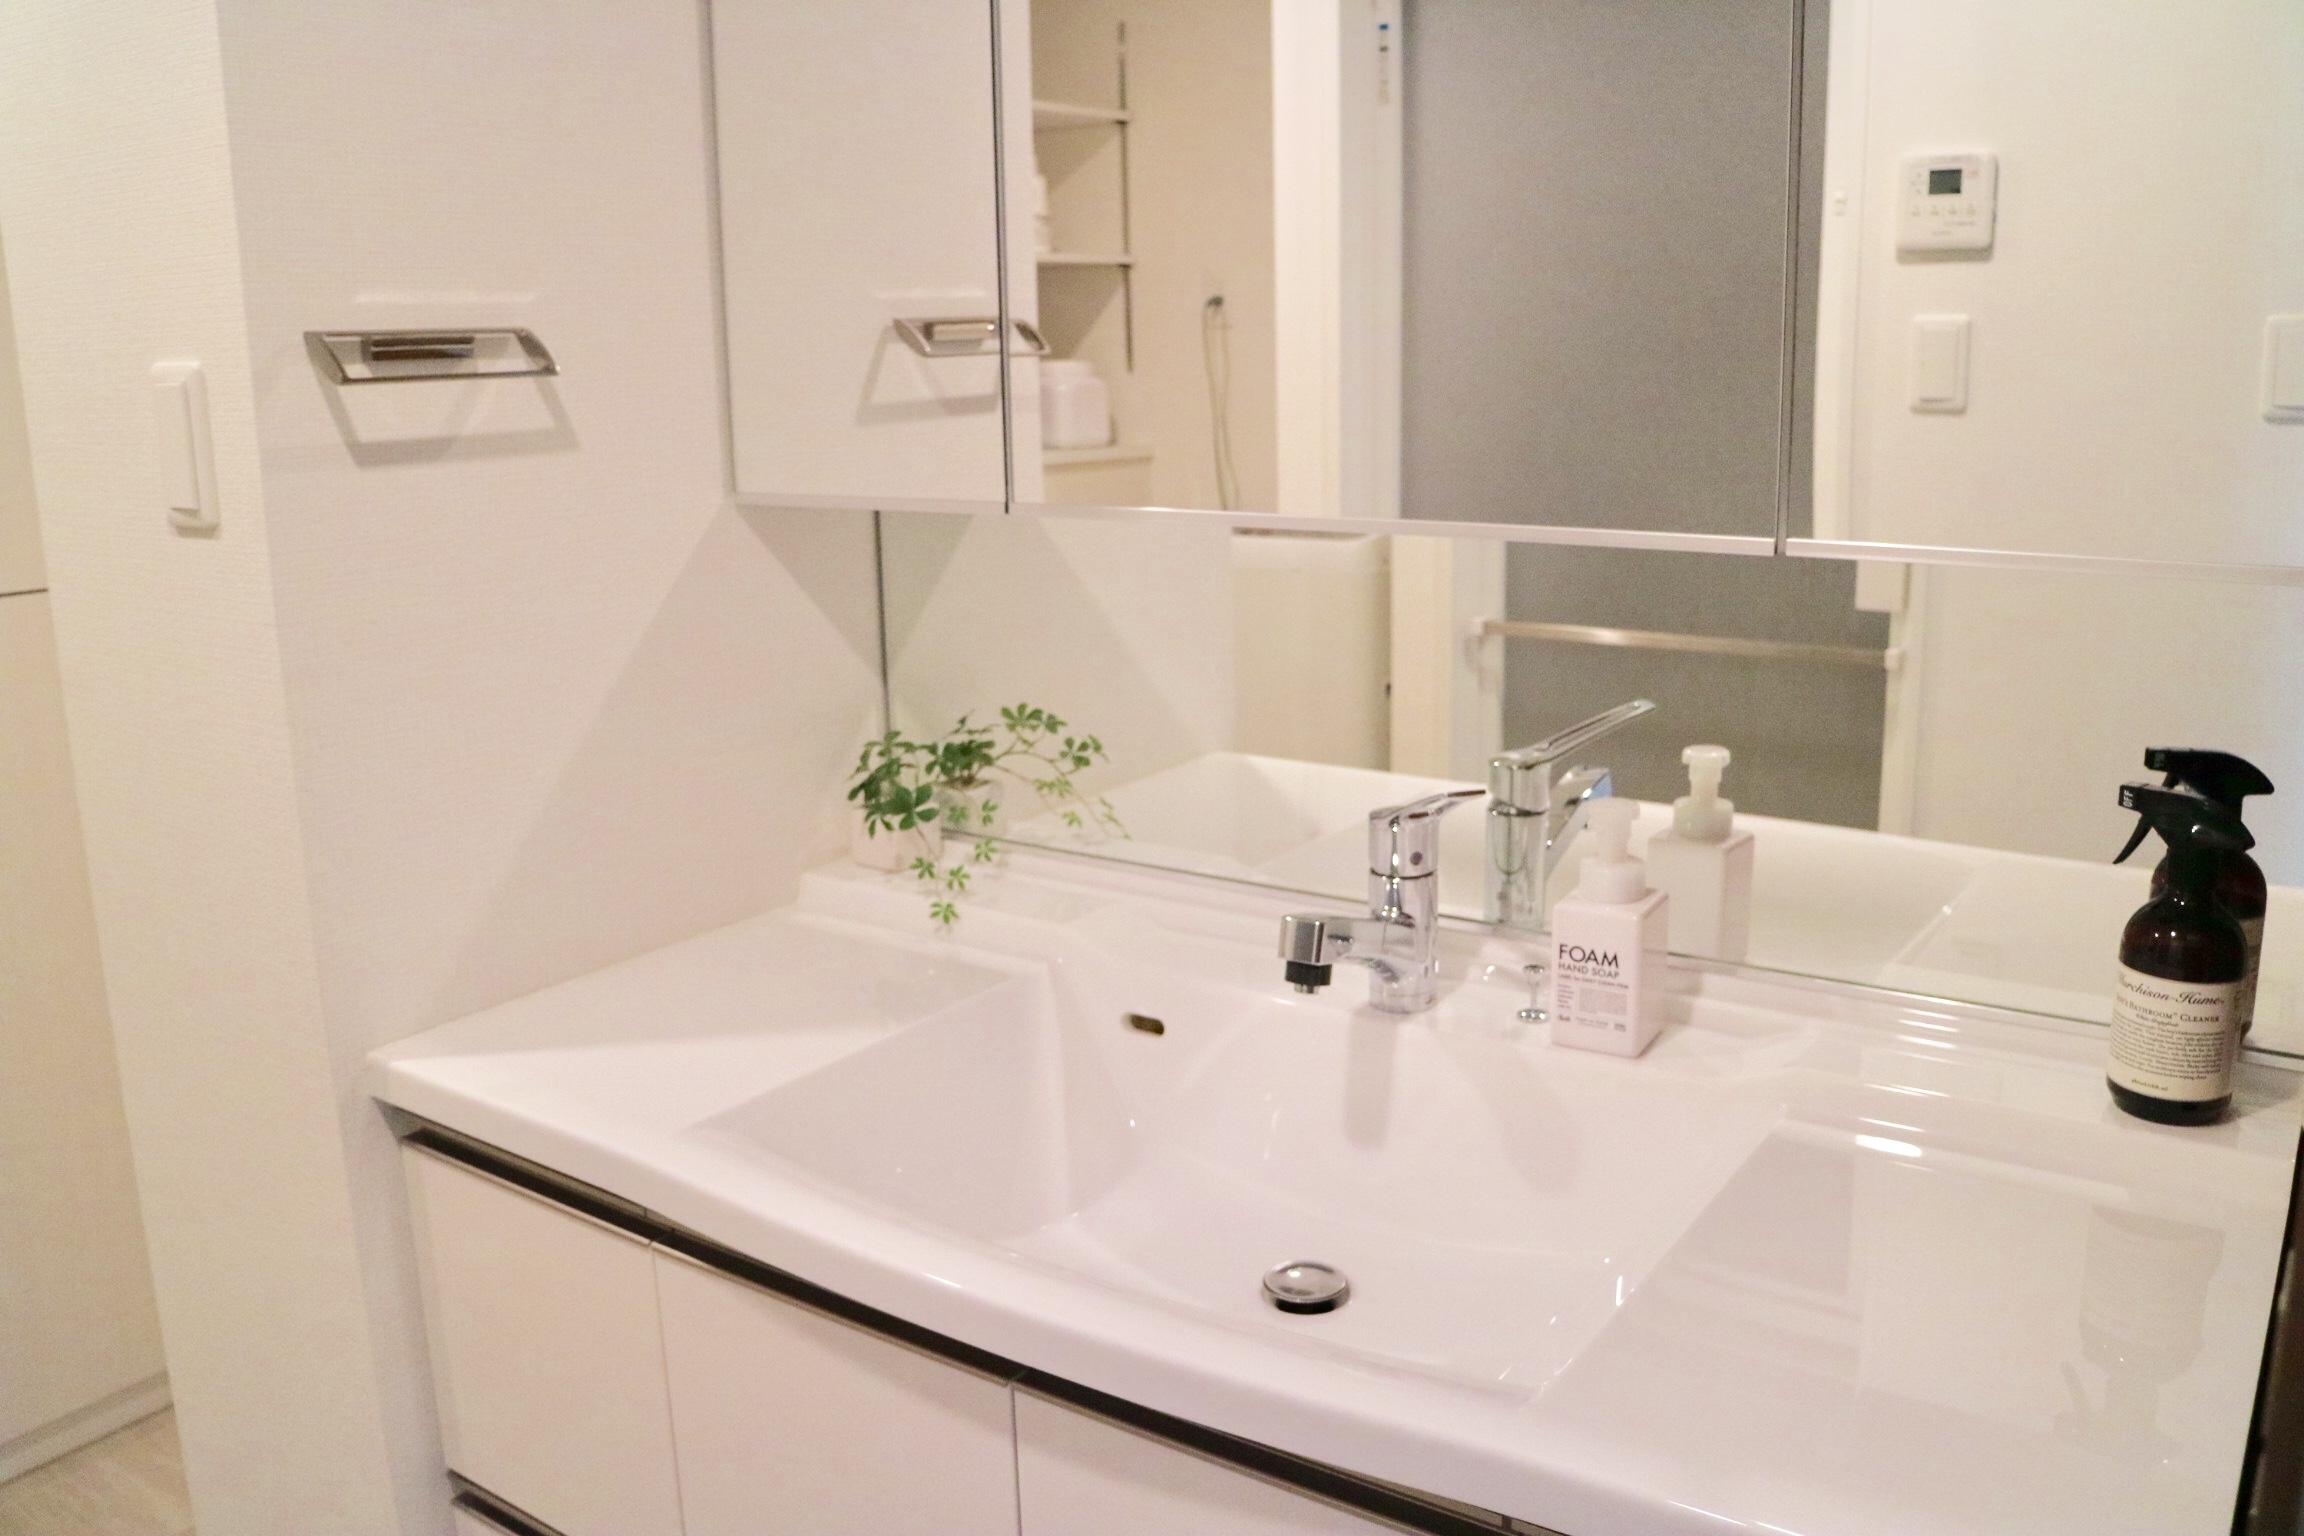 【WEB内覧会】マンションのお洒落な洗面台をキレイに保つ秘訣